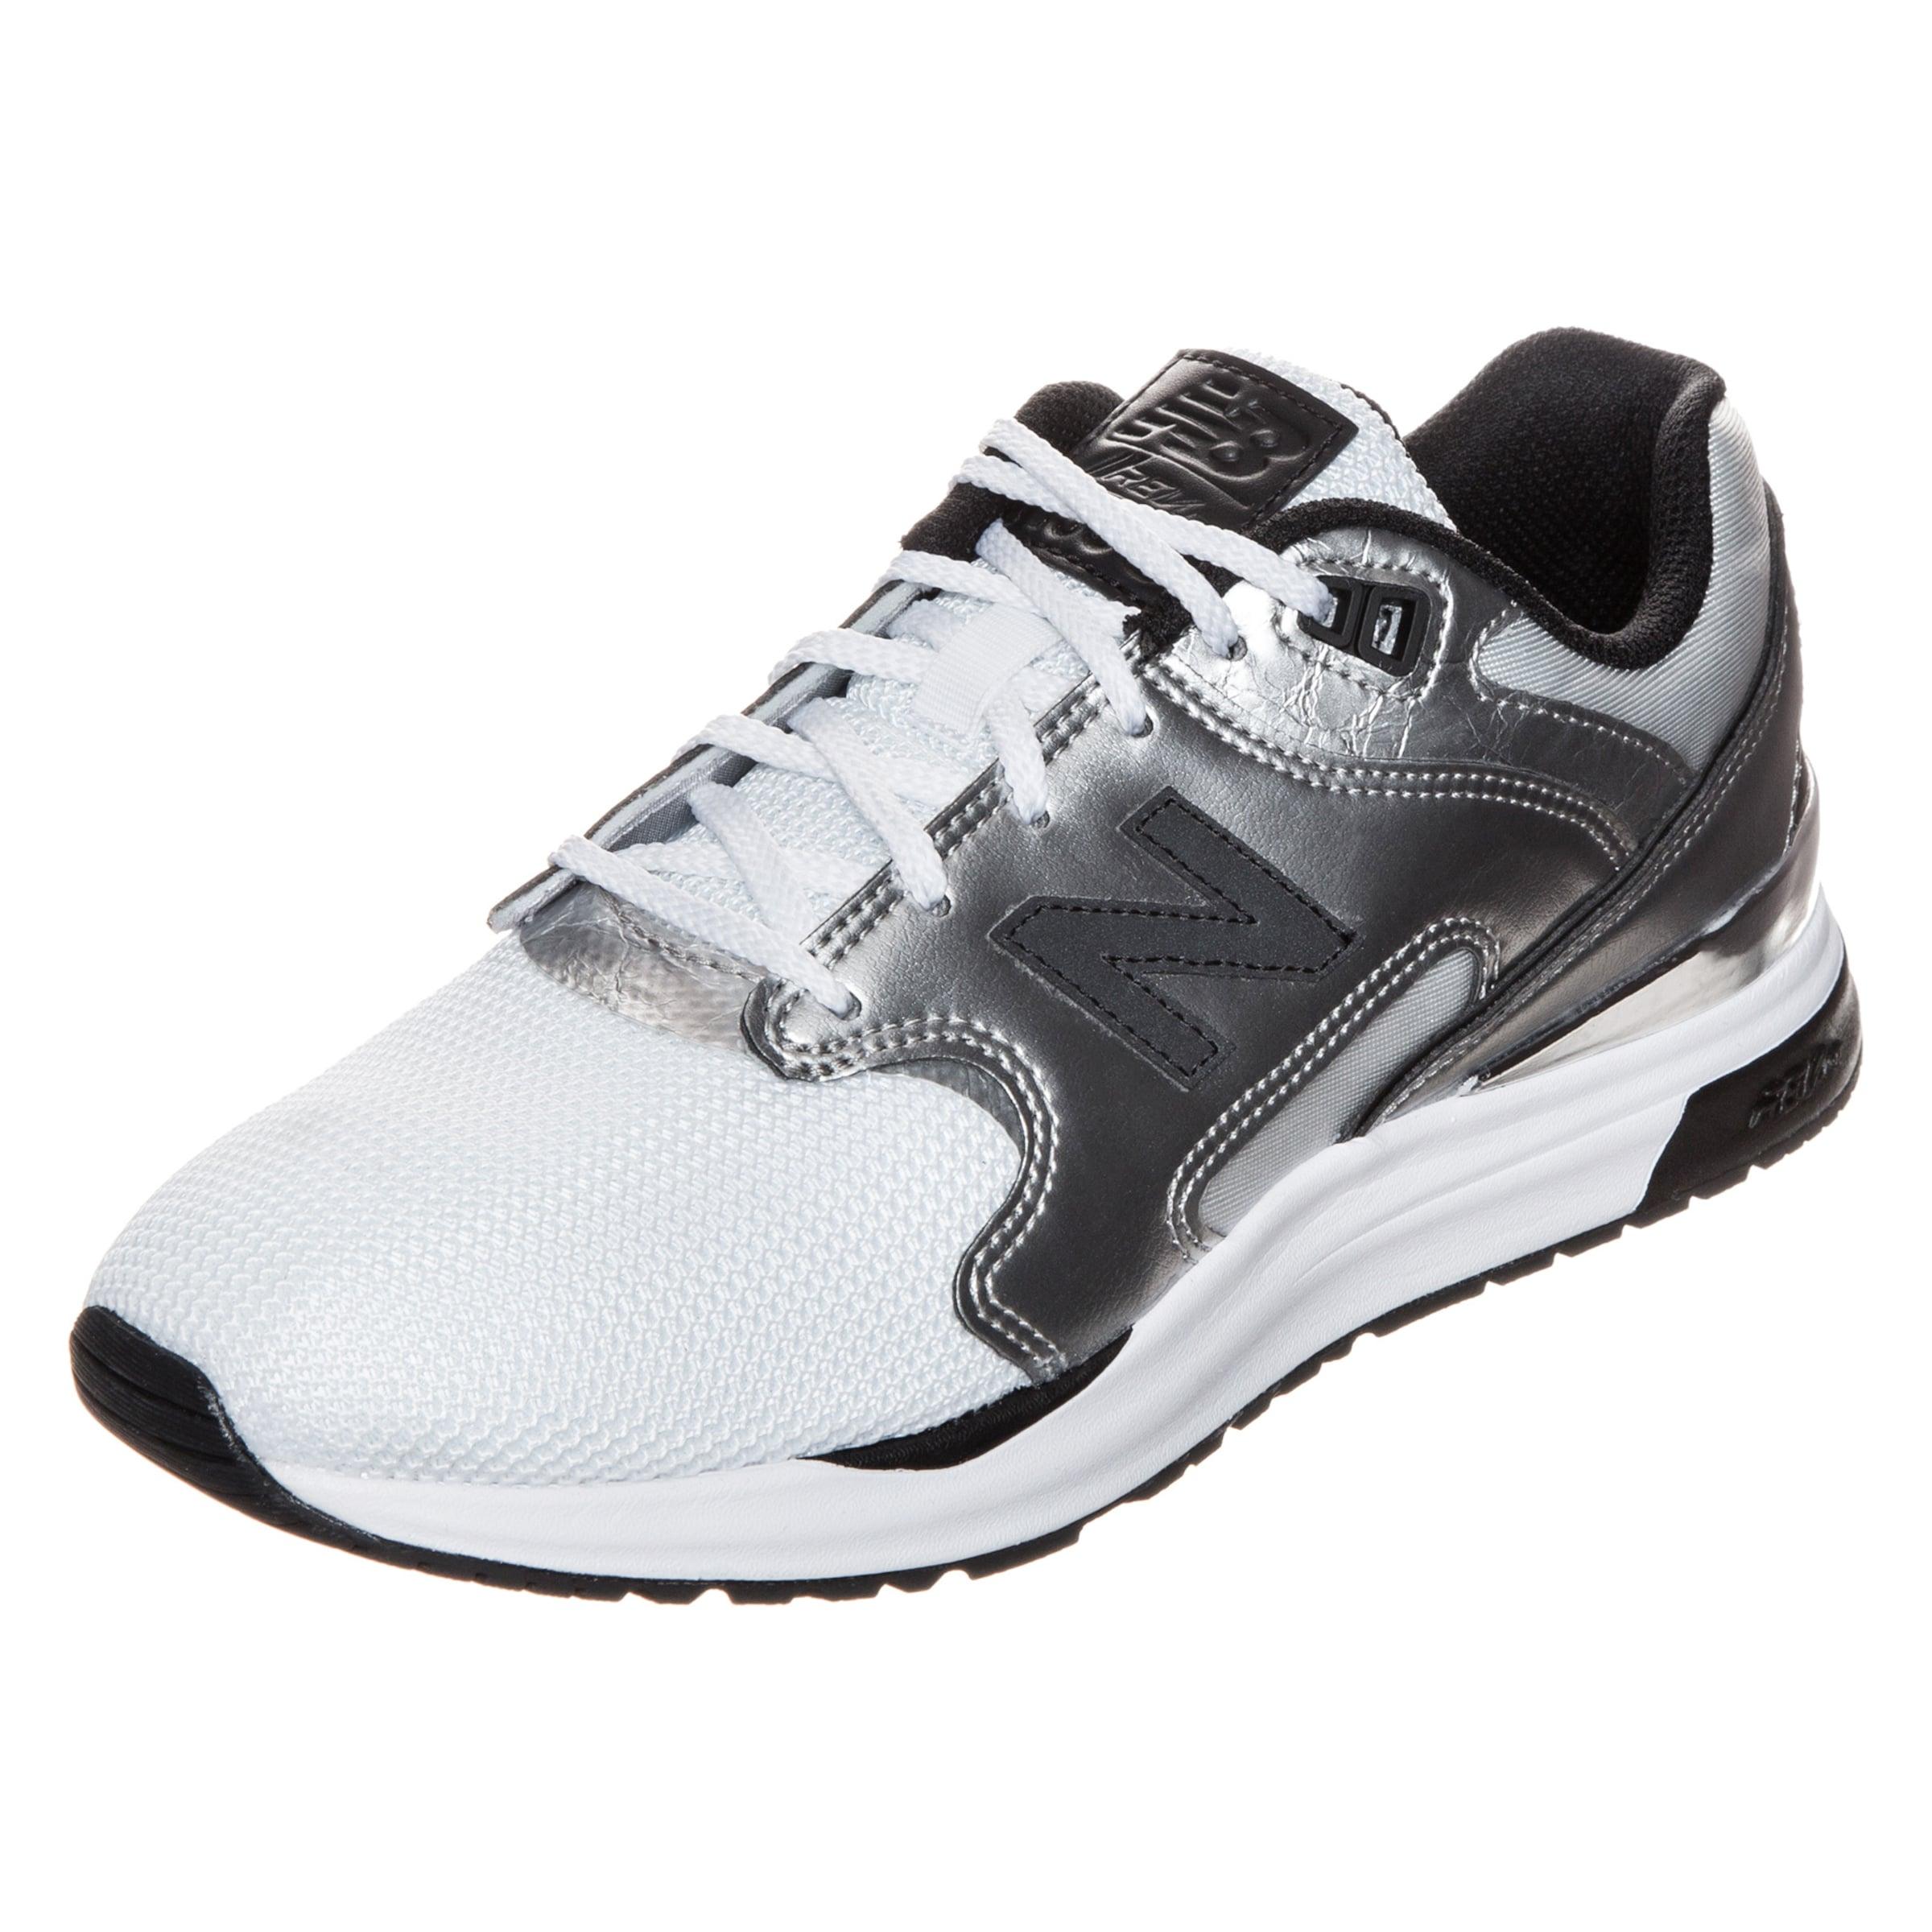 new balance Sneaker WL1550-MB-B Verschleißfeste billige Schuhe